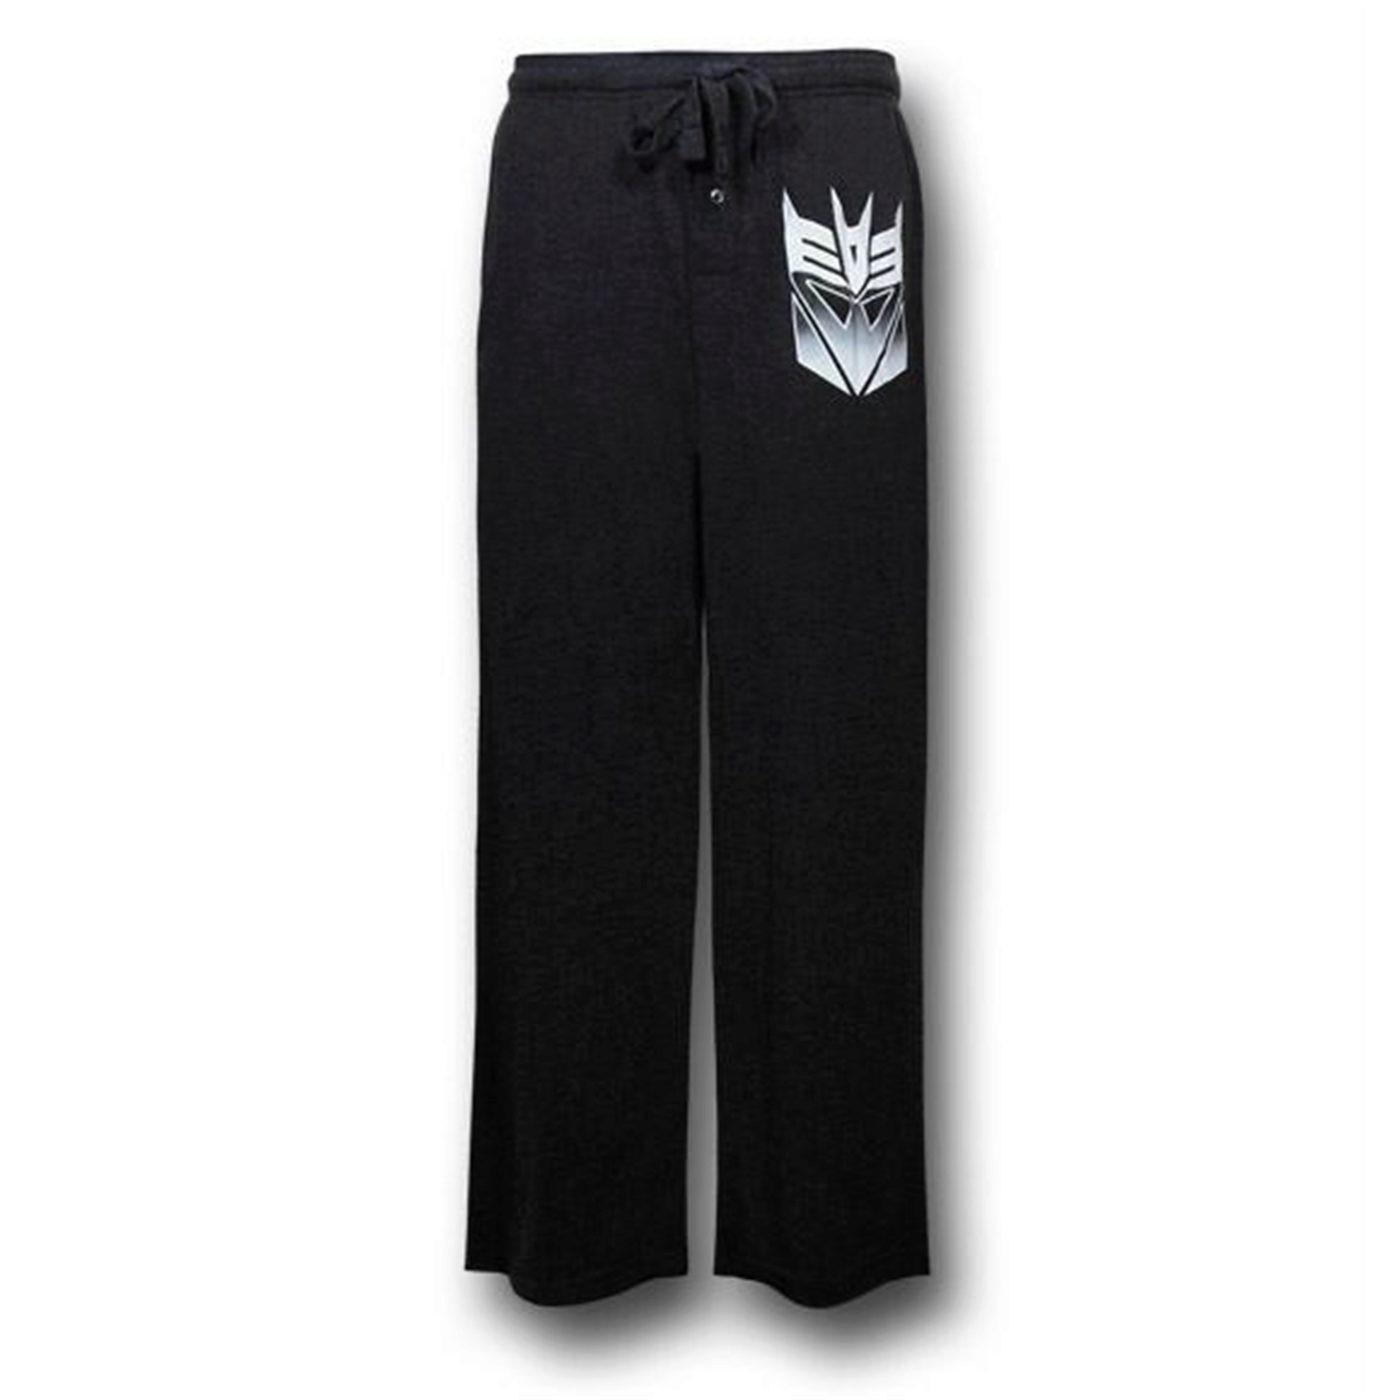 Transformers Decepticon Black Sleep Pants